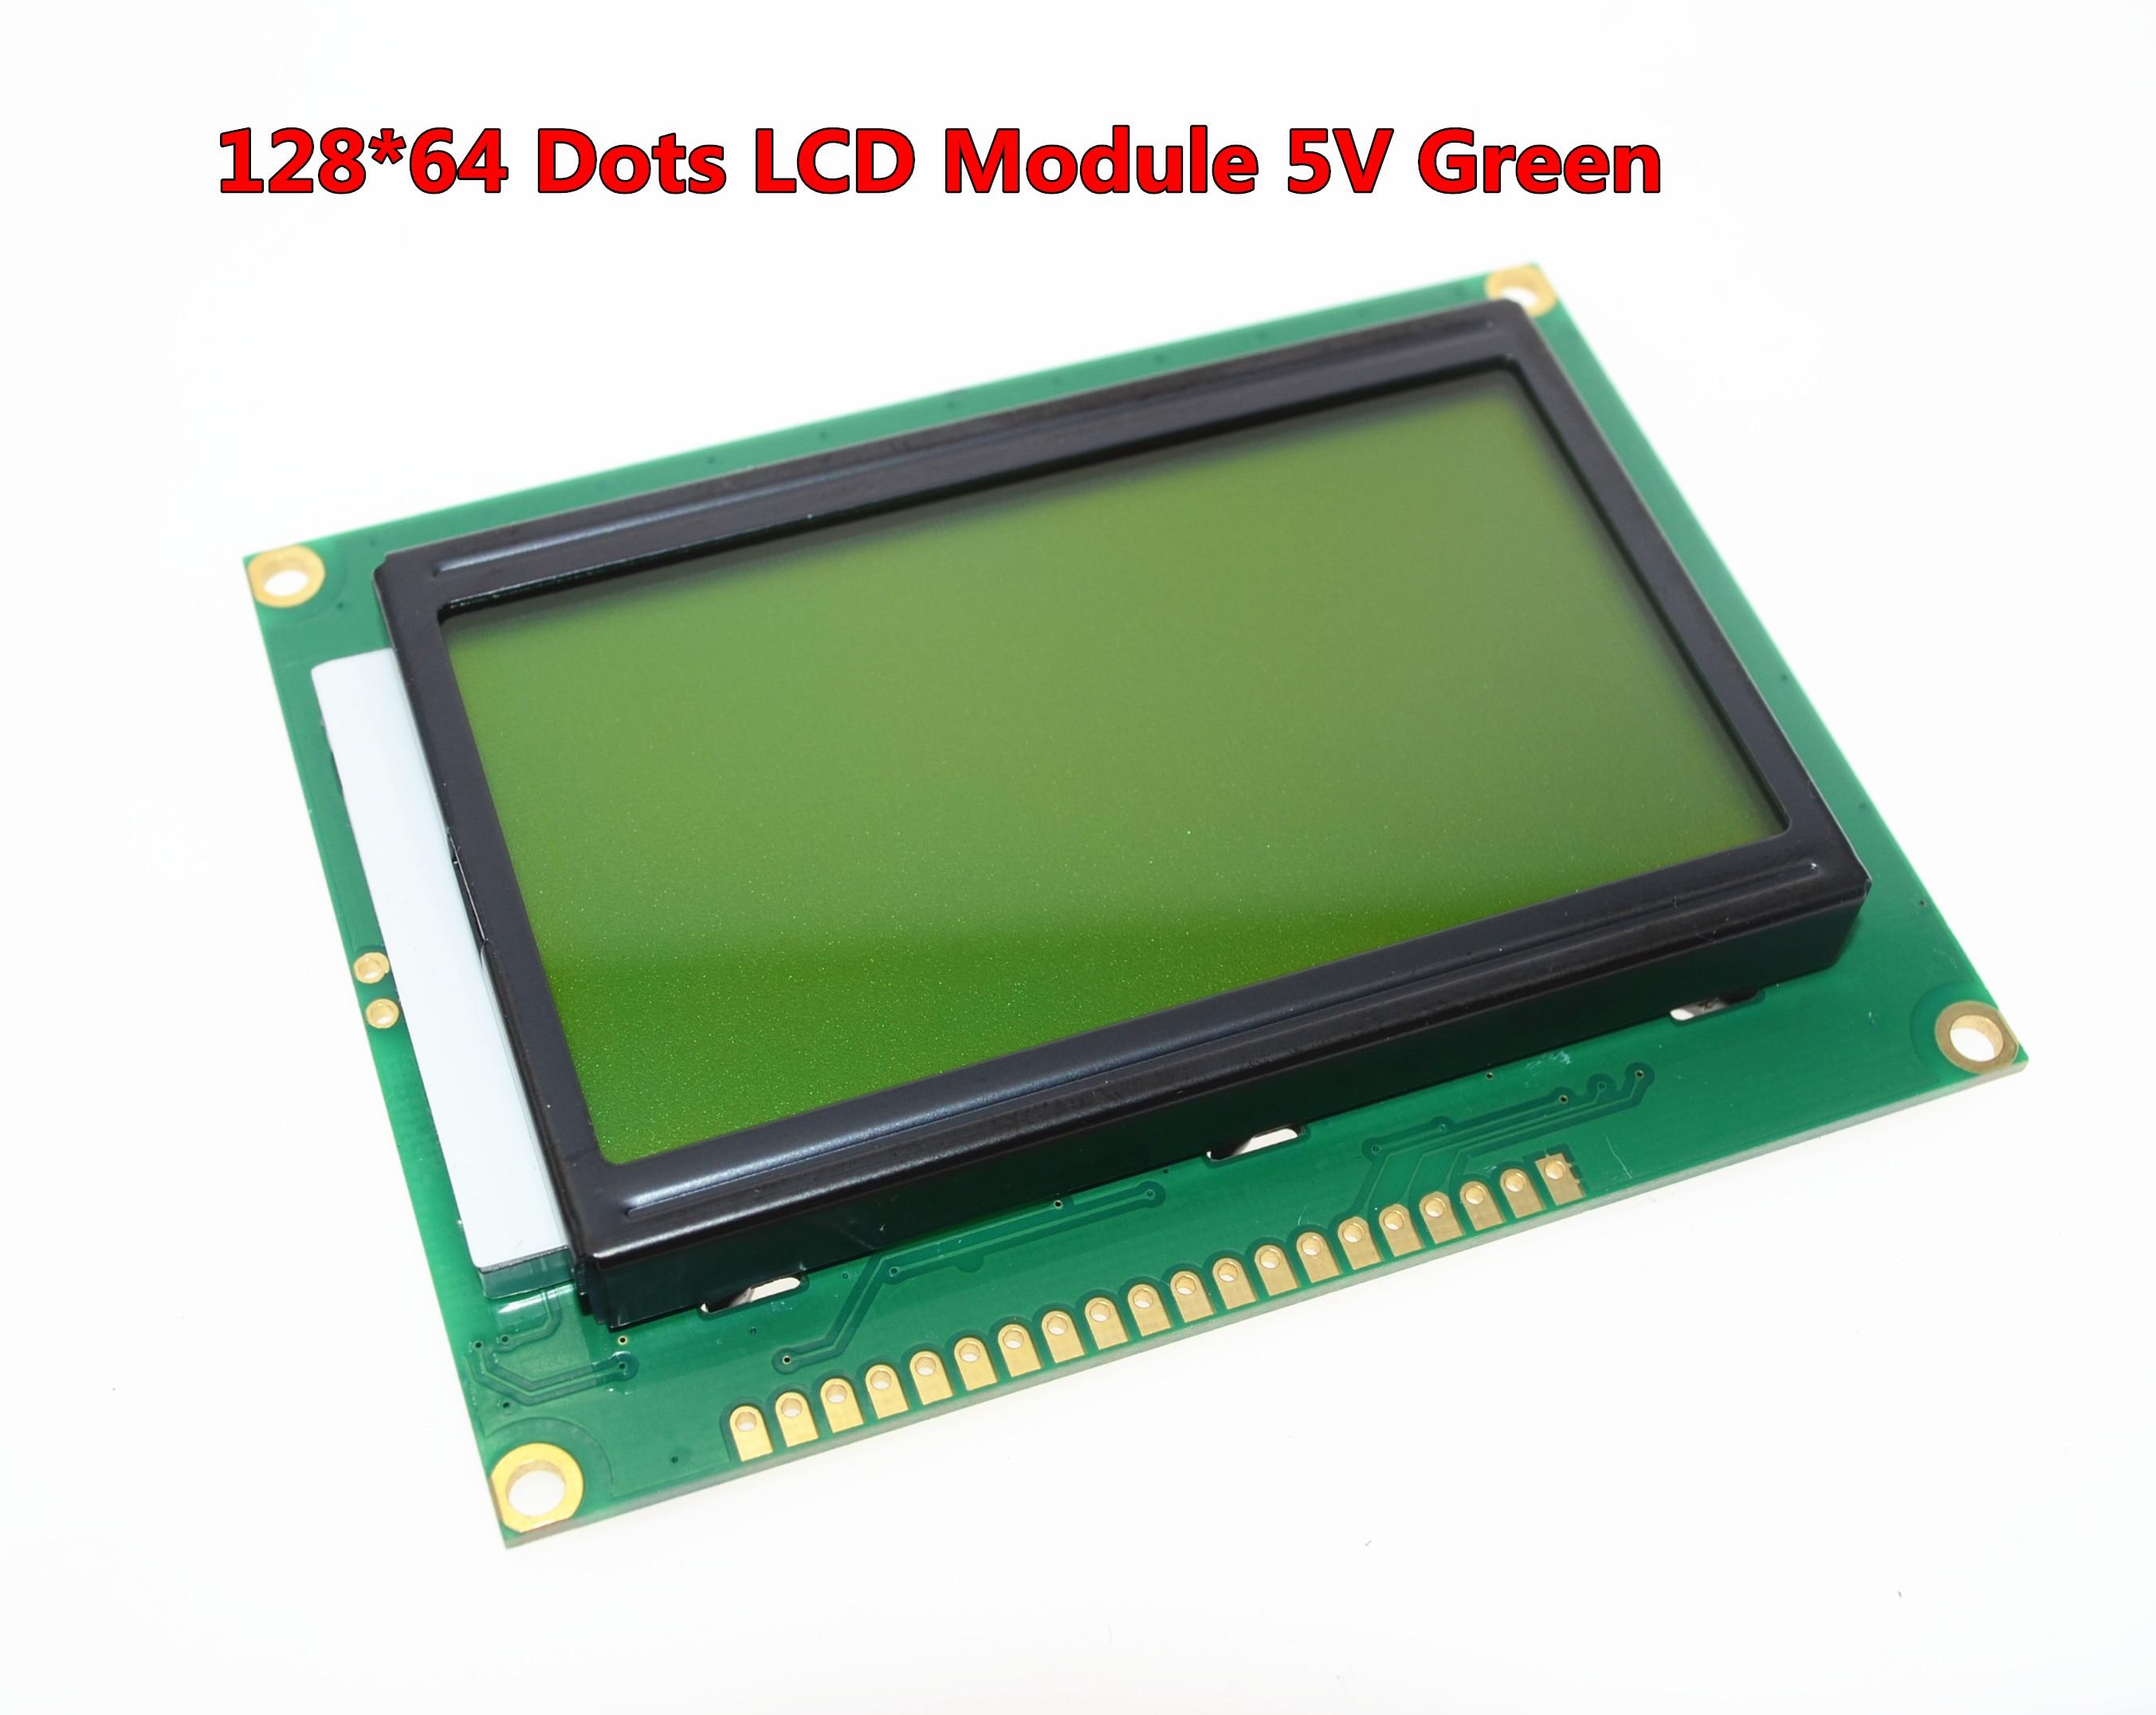 Frete grátis 12864 128x64 pontos gráfico cor verde backlight display lcd módulo para arduino raspberry pi